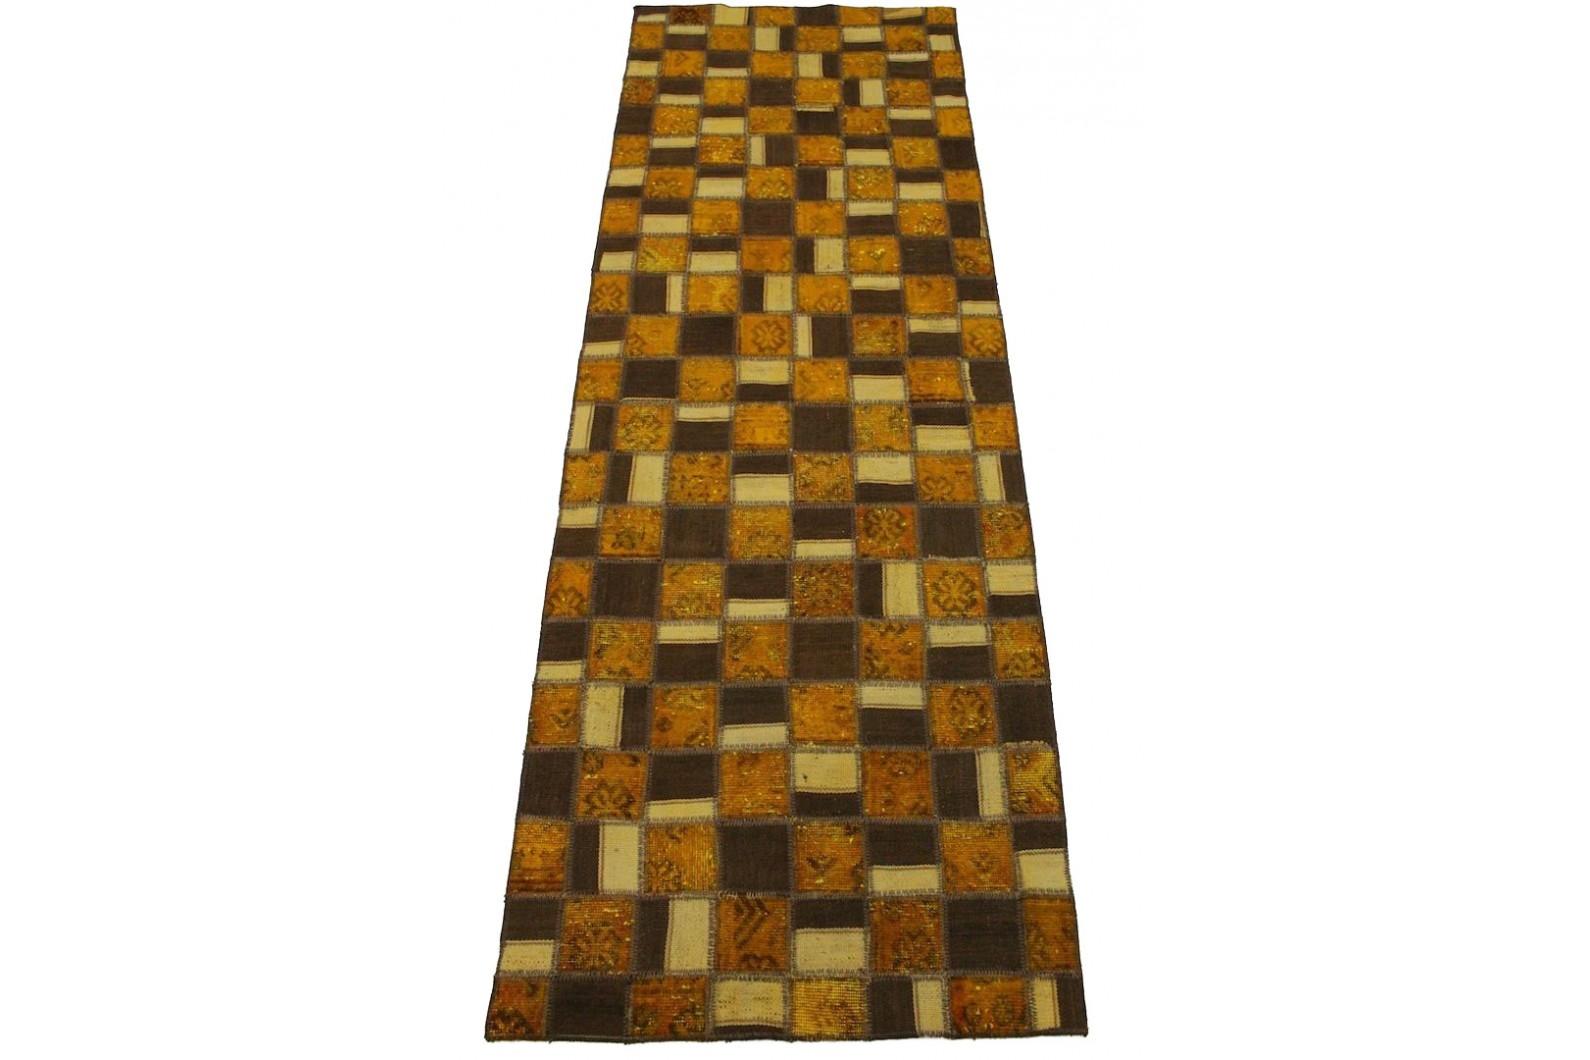 patchwork teppich braun rost in 230x90cm 1001 2982 bei. Black Bedroom Furniture Sets. Home Design Ideas